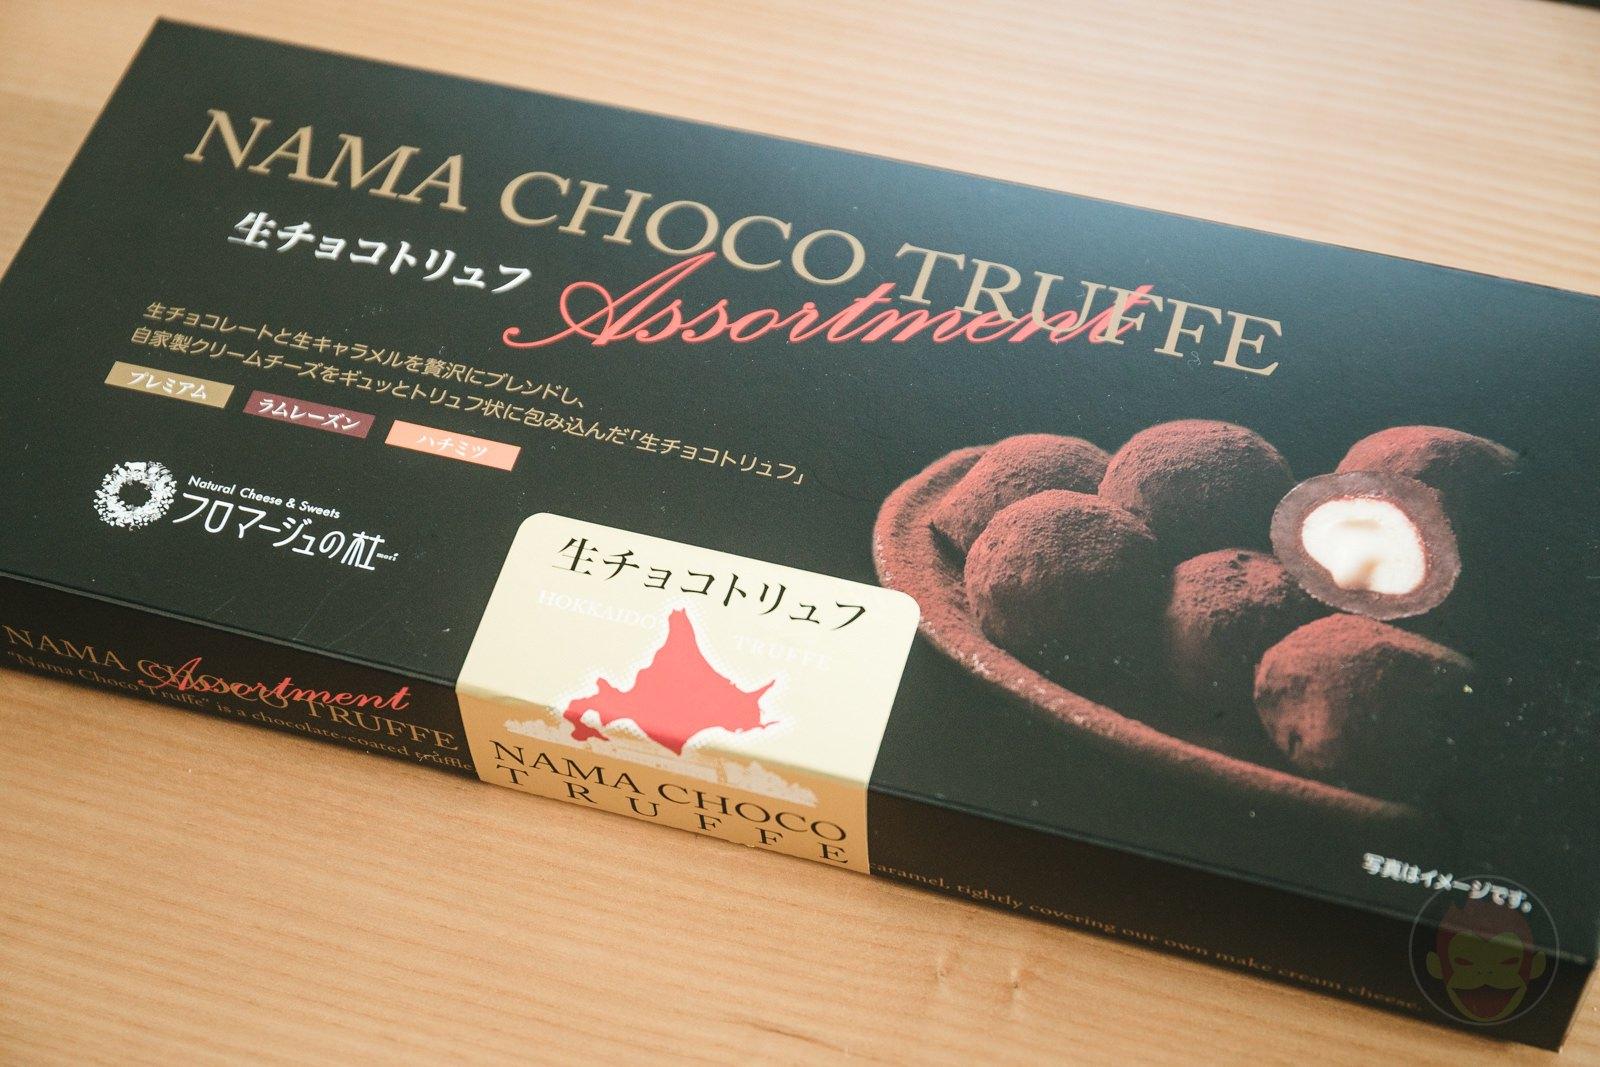 Nama Choco Truffe Costco 07